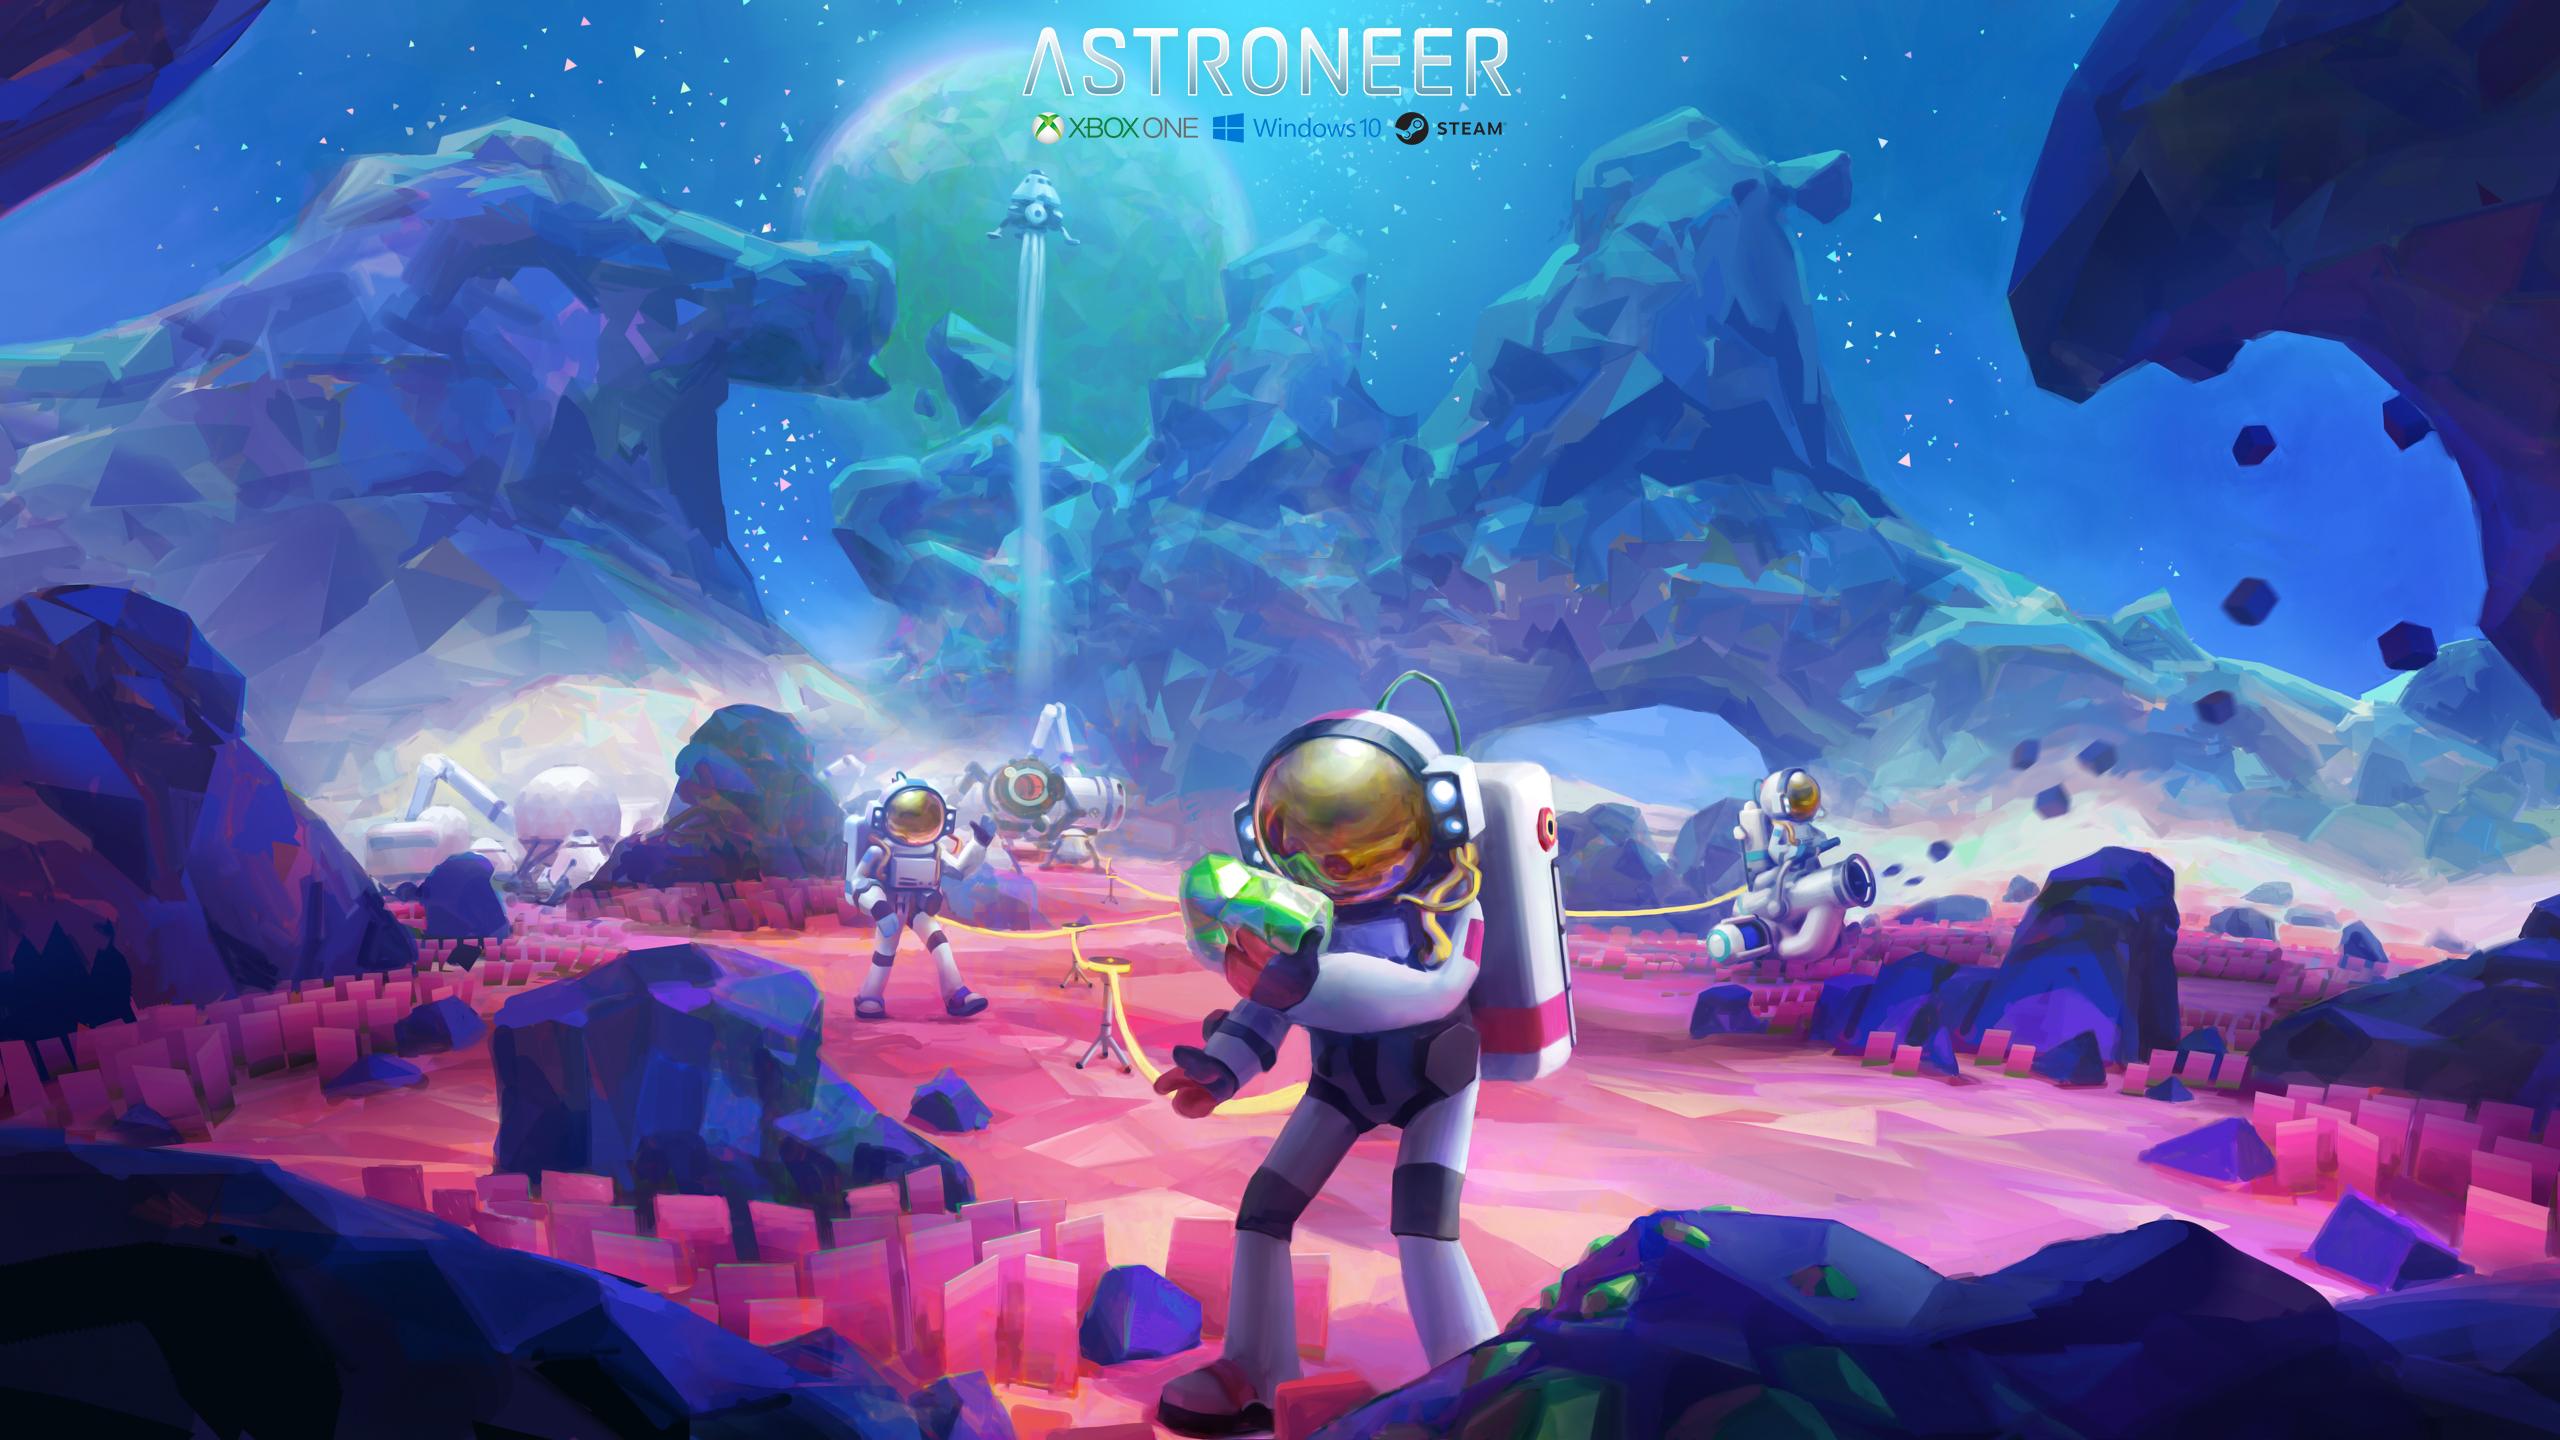 Astroneer Ya Disponible En Pc Y Xbox One Pc Indie Master Race